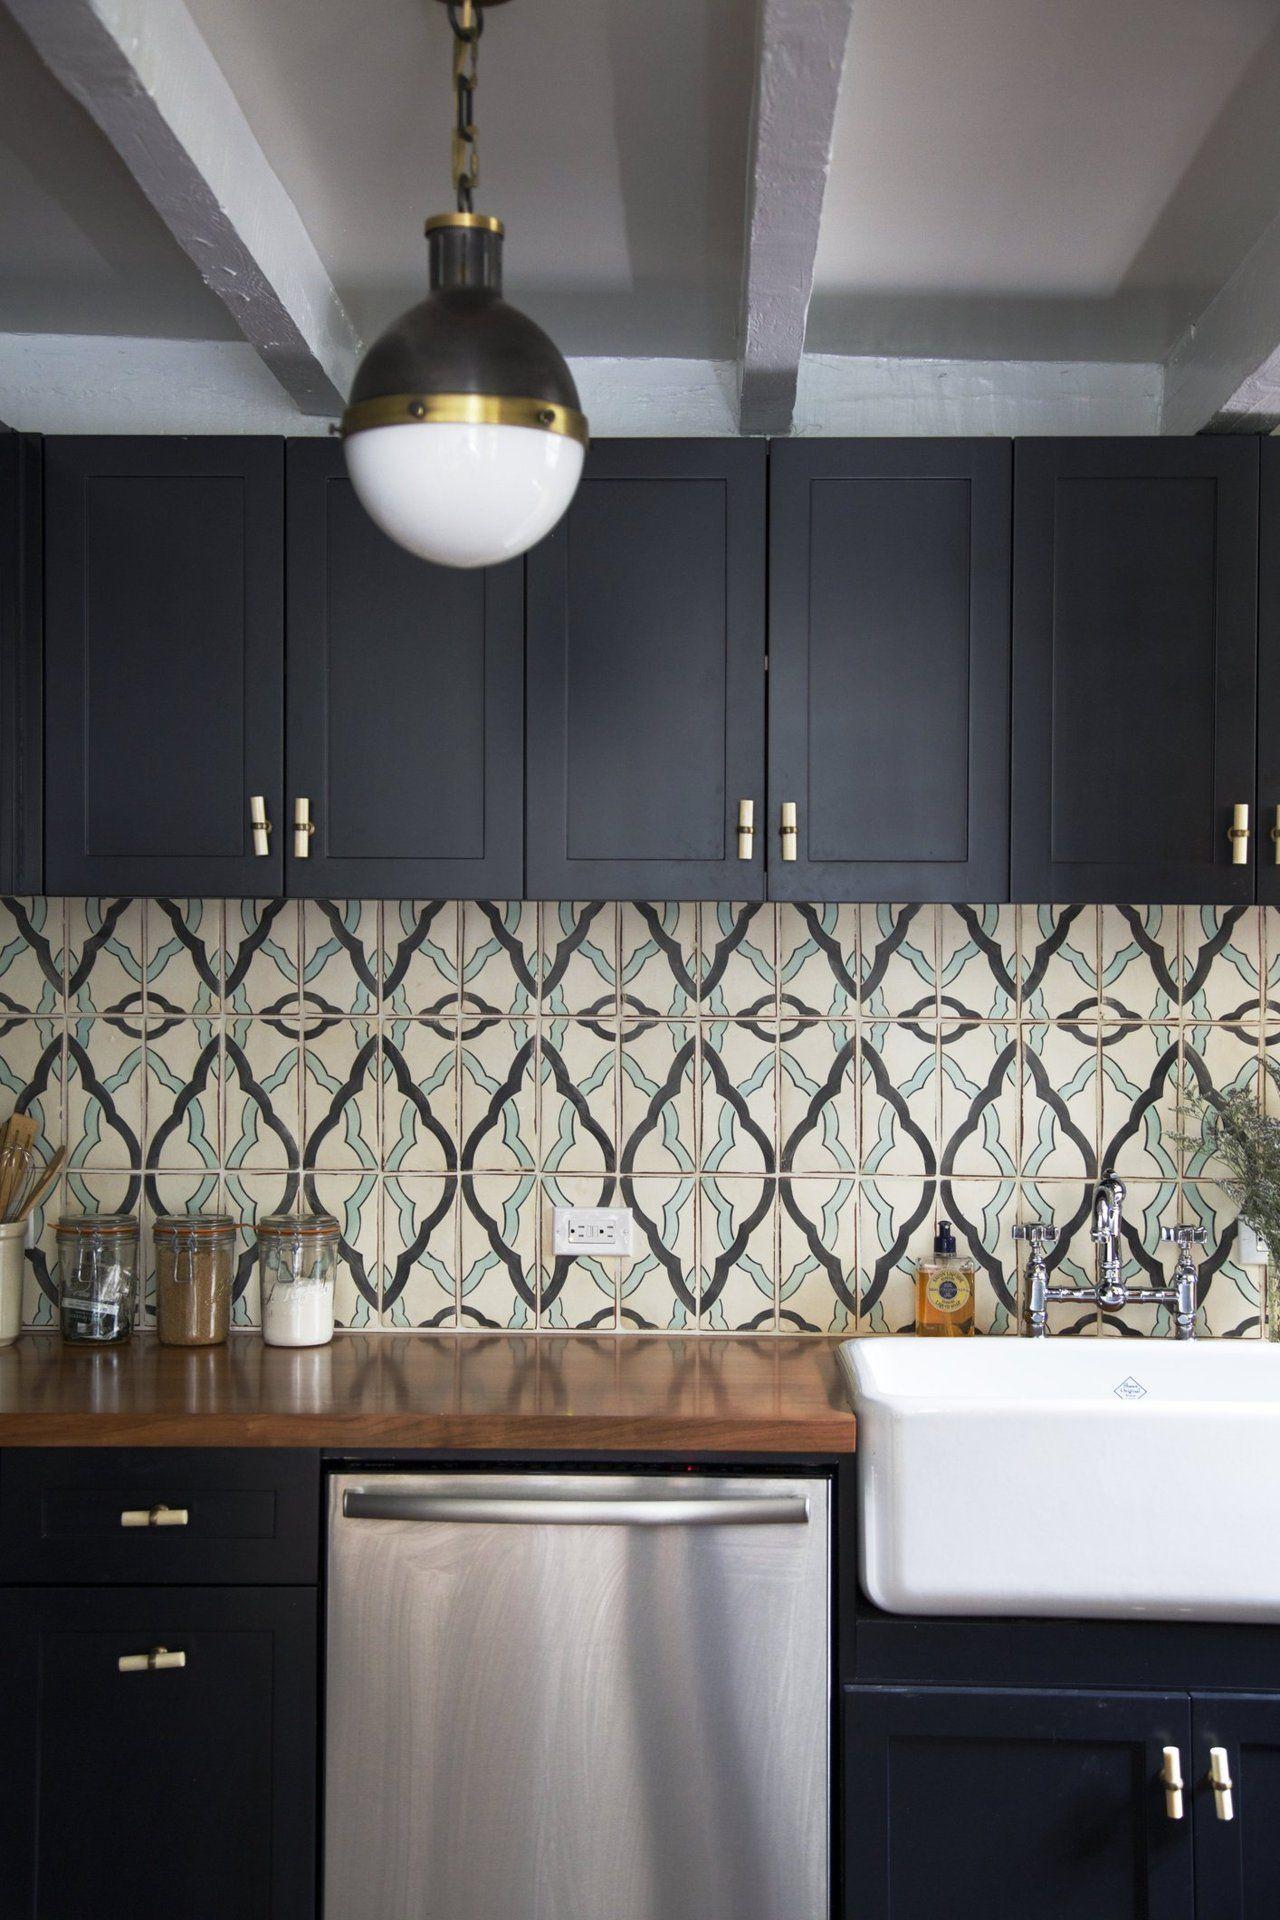 House Tour: An Eclectic East Village Apartment | Cocinas, Comprar y ...